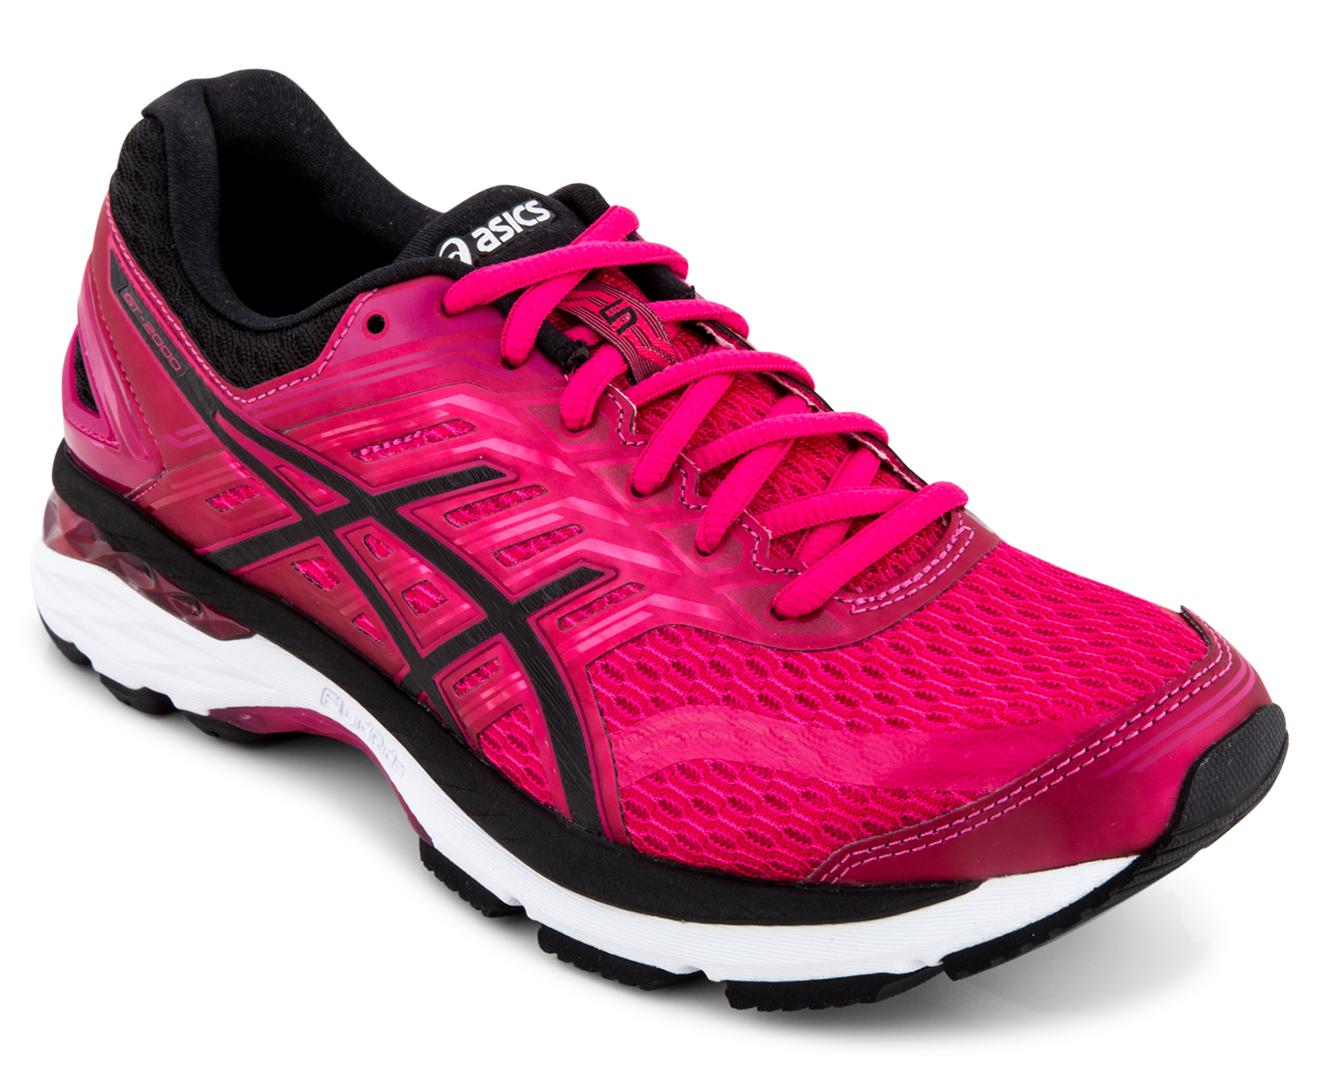 Asics Women S Gt 2000 5 Shoe Cosmo Pink Black White